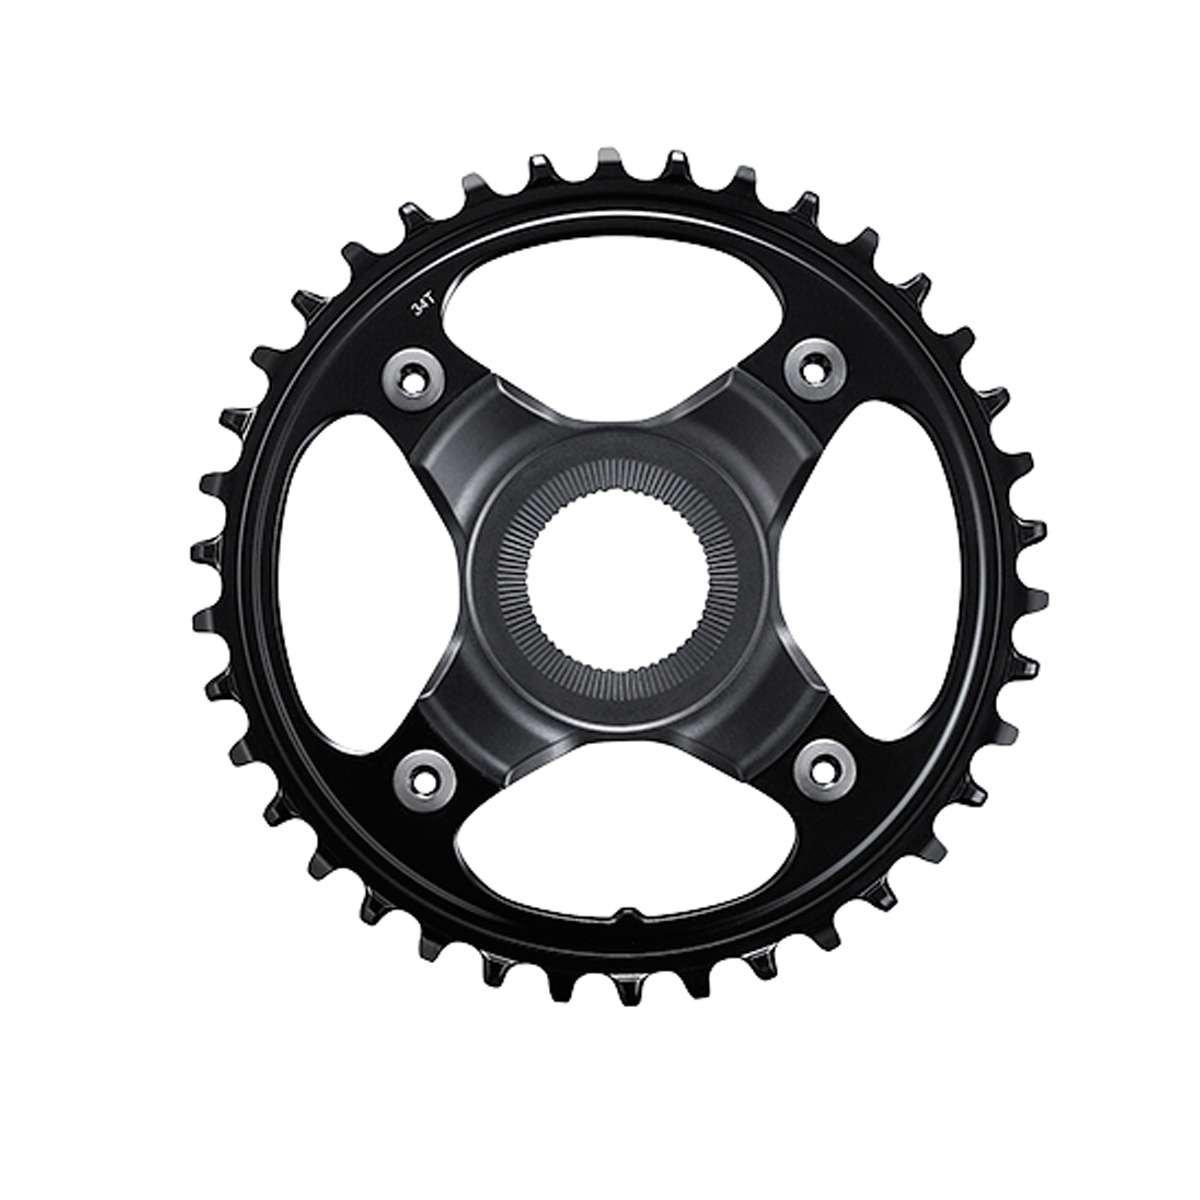 Shimano手順電動自転車自転車Chainring – sm-cre80 B075WRC1SP38T